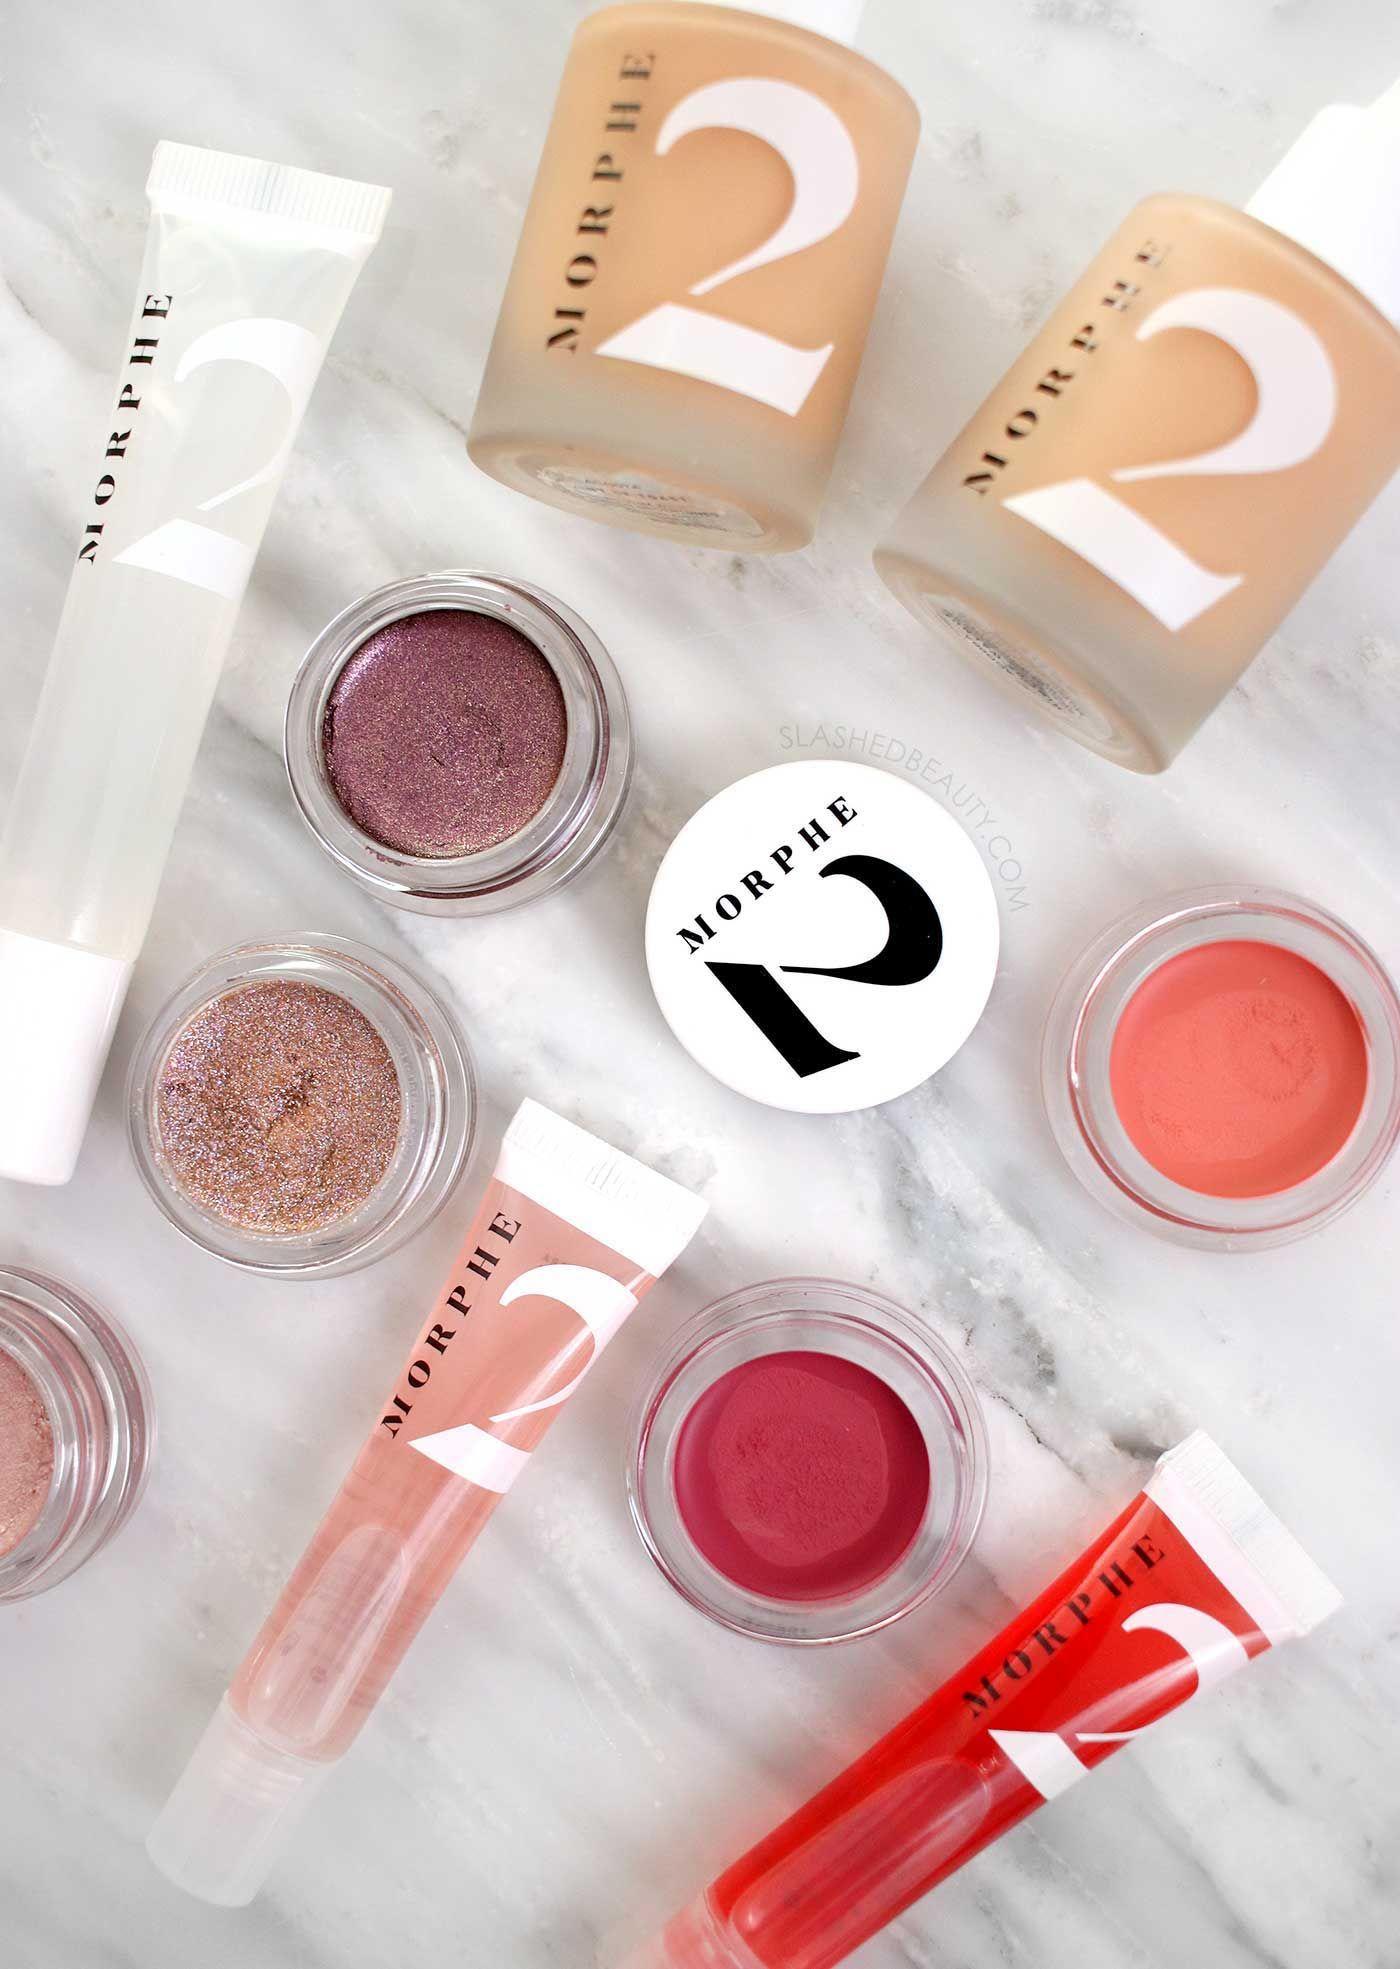 REVIEW: Morphe 2 Makeup Line on Combo Skin   Slashed Beauty